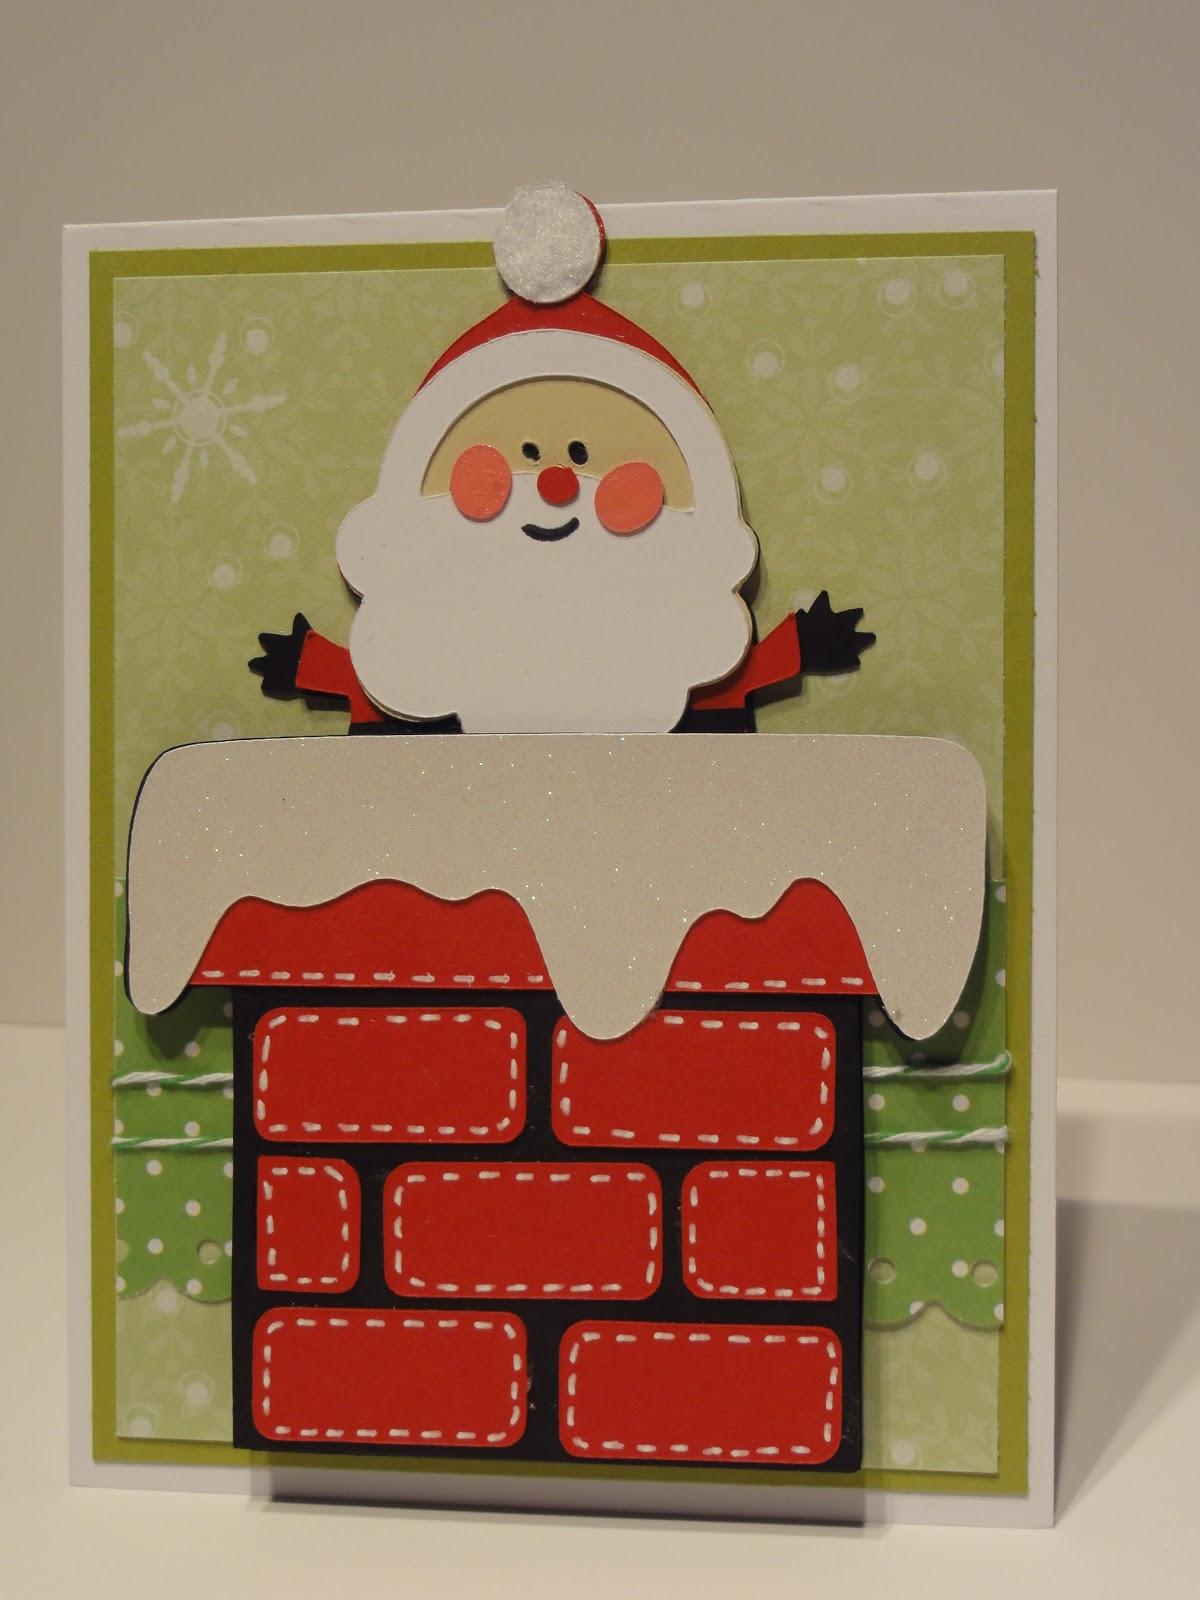 Krafty Kyle Designs: Christmas Cards Galore - Cute Santa Card